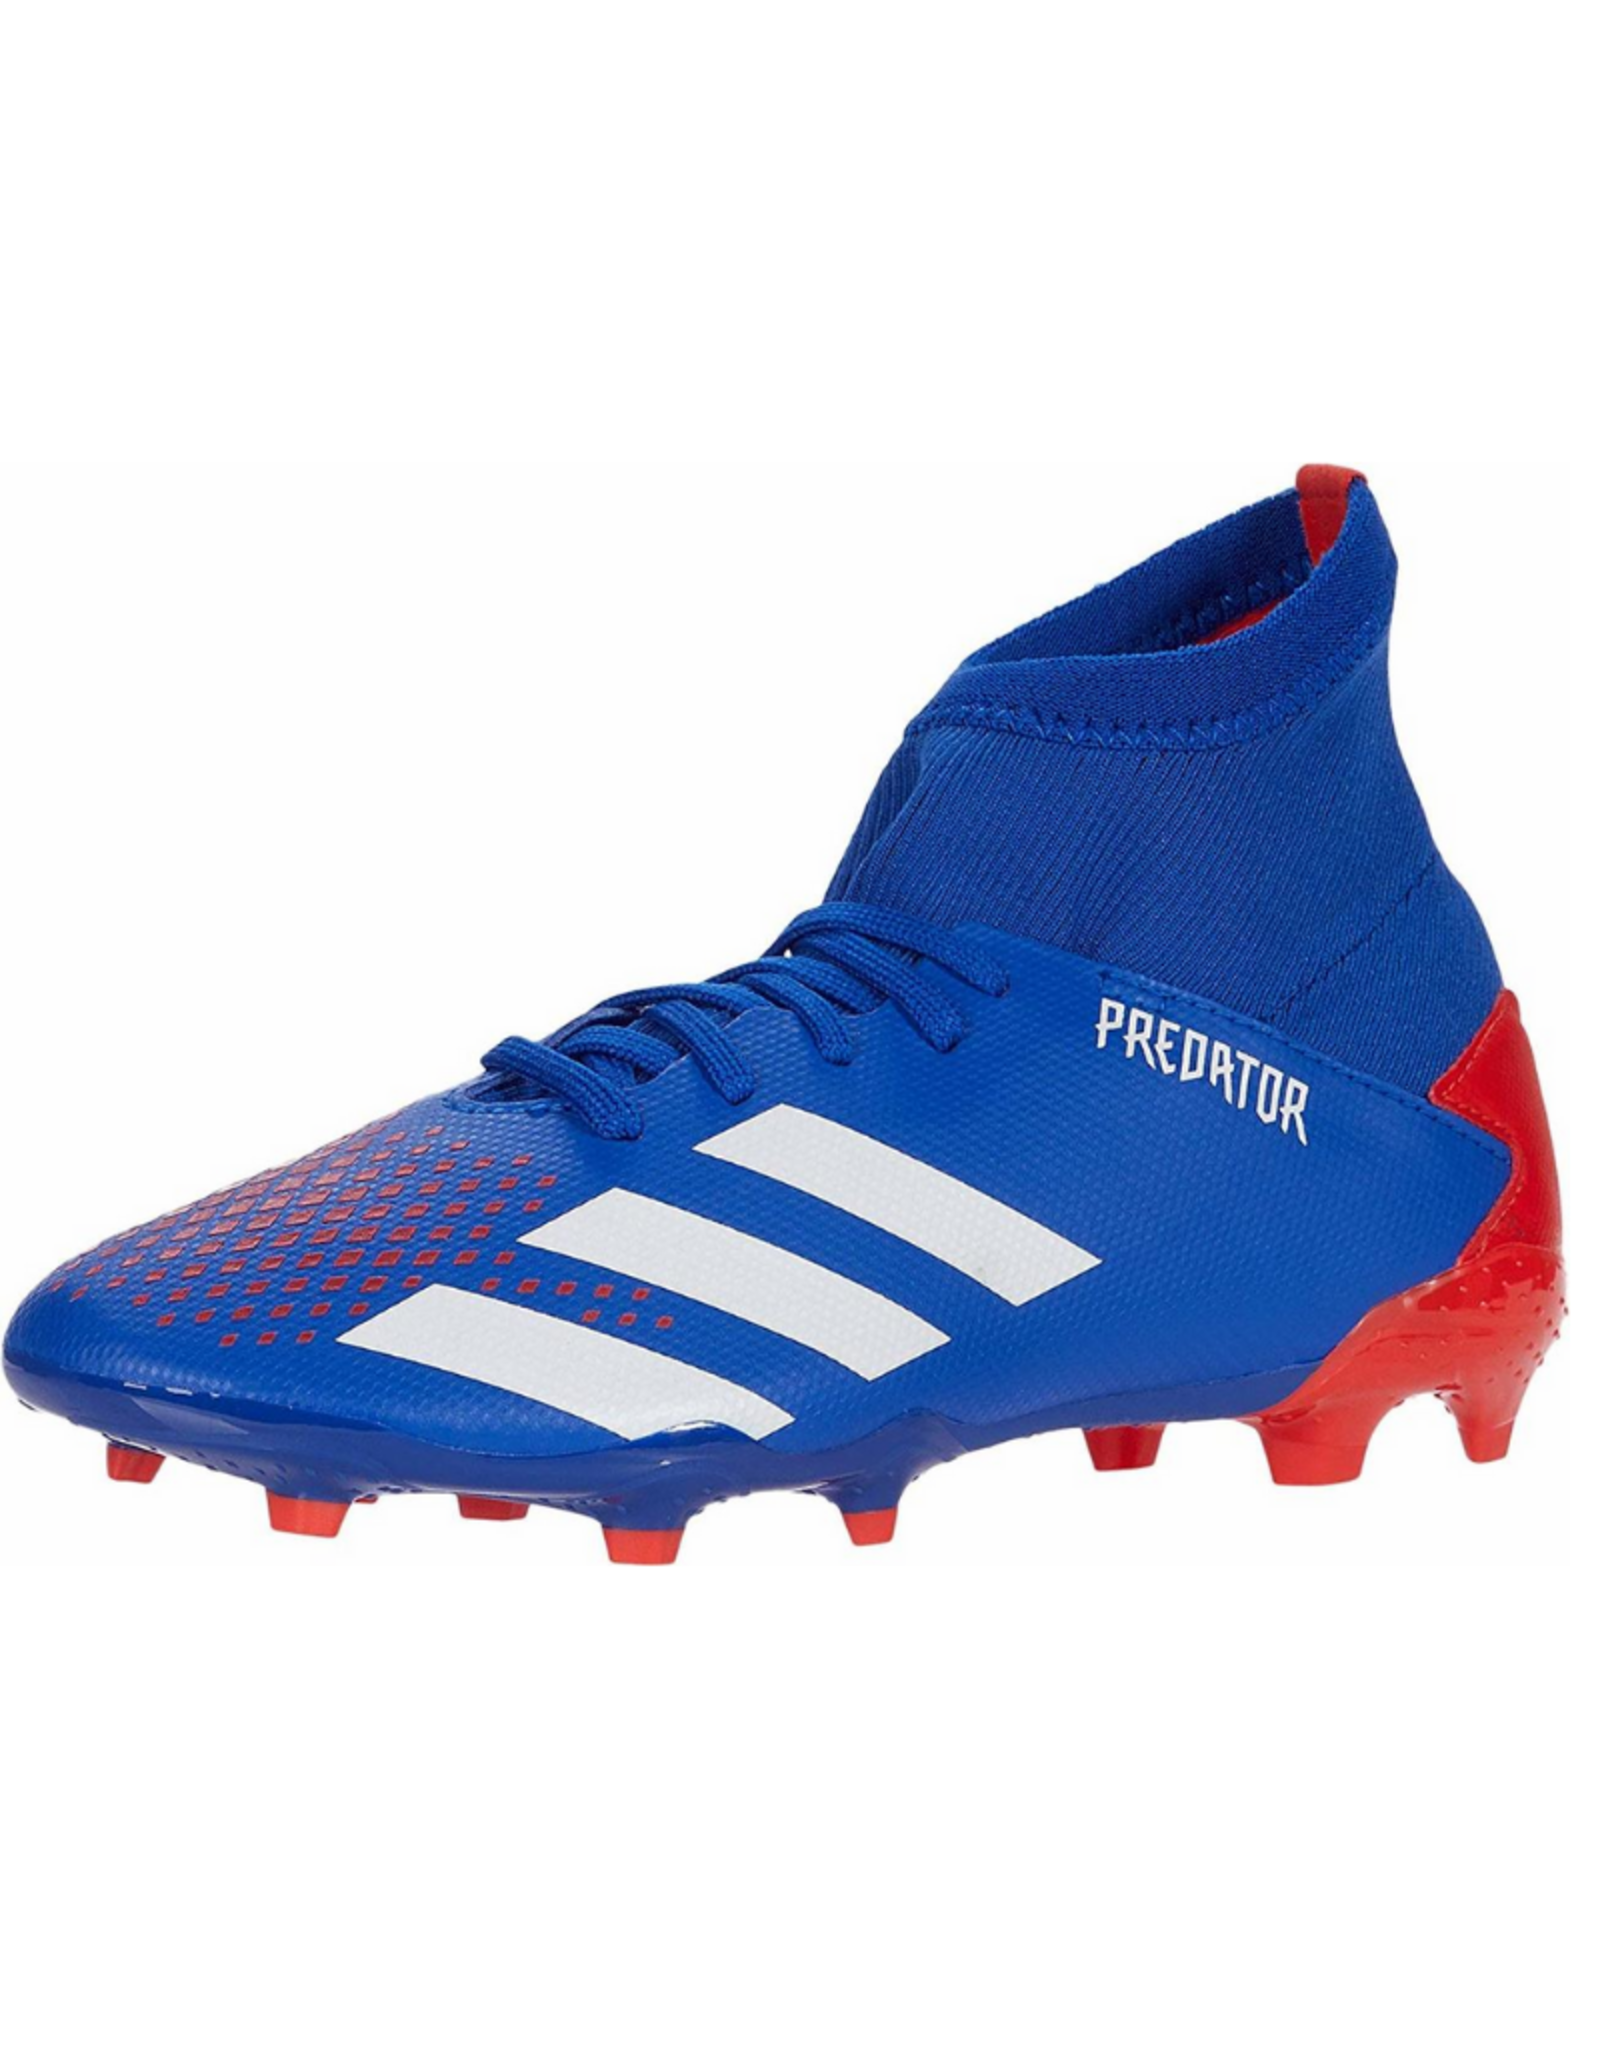 Adidas Predator 20.3 FG Soccer Cleat